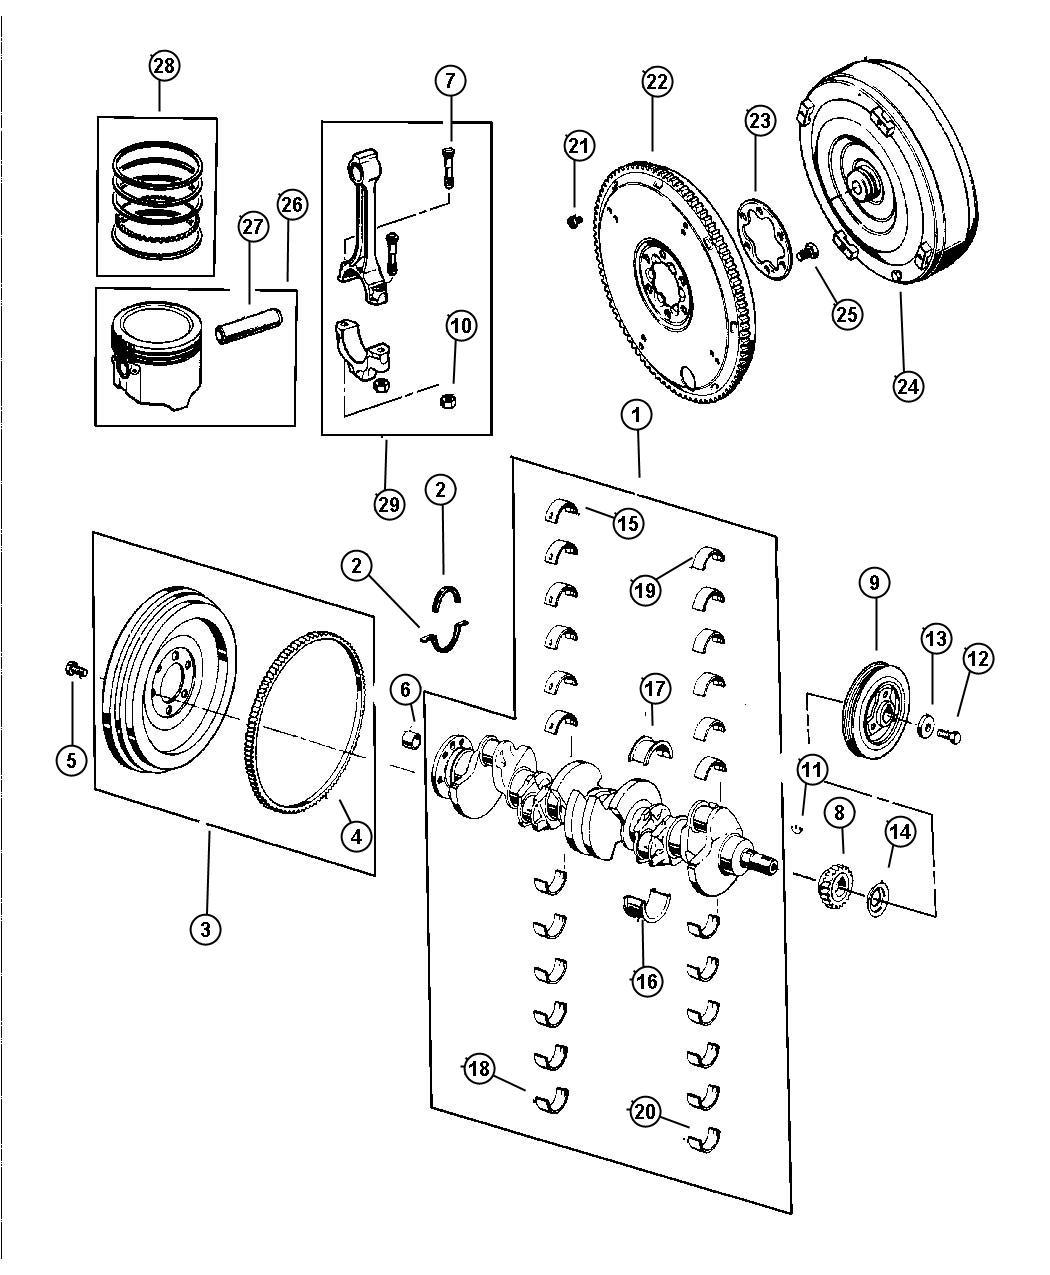 Jeep Wrangler Crankshaft Piston And Torque Converter